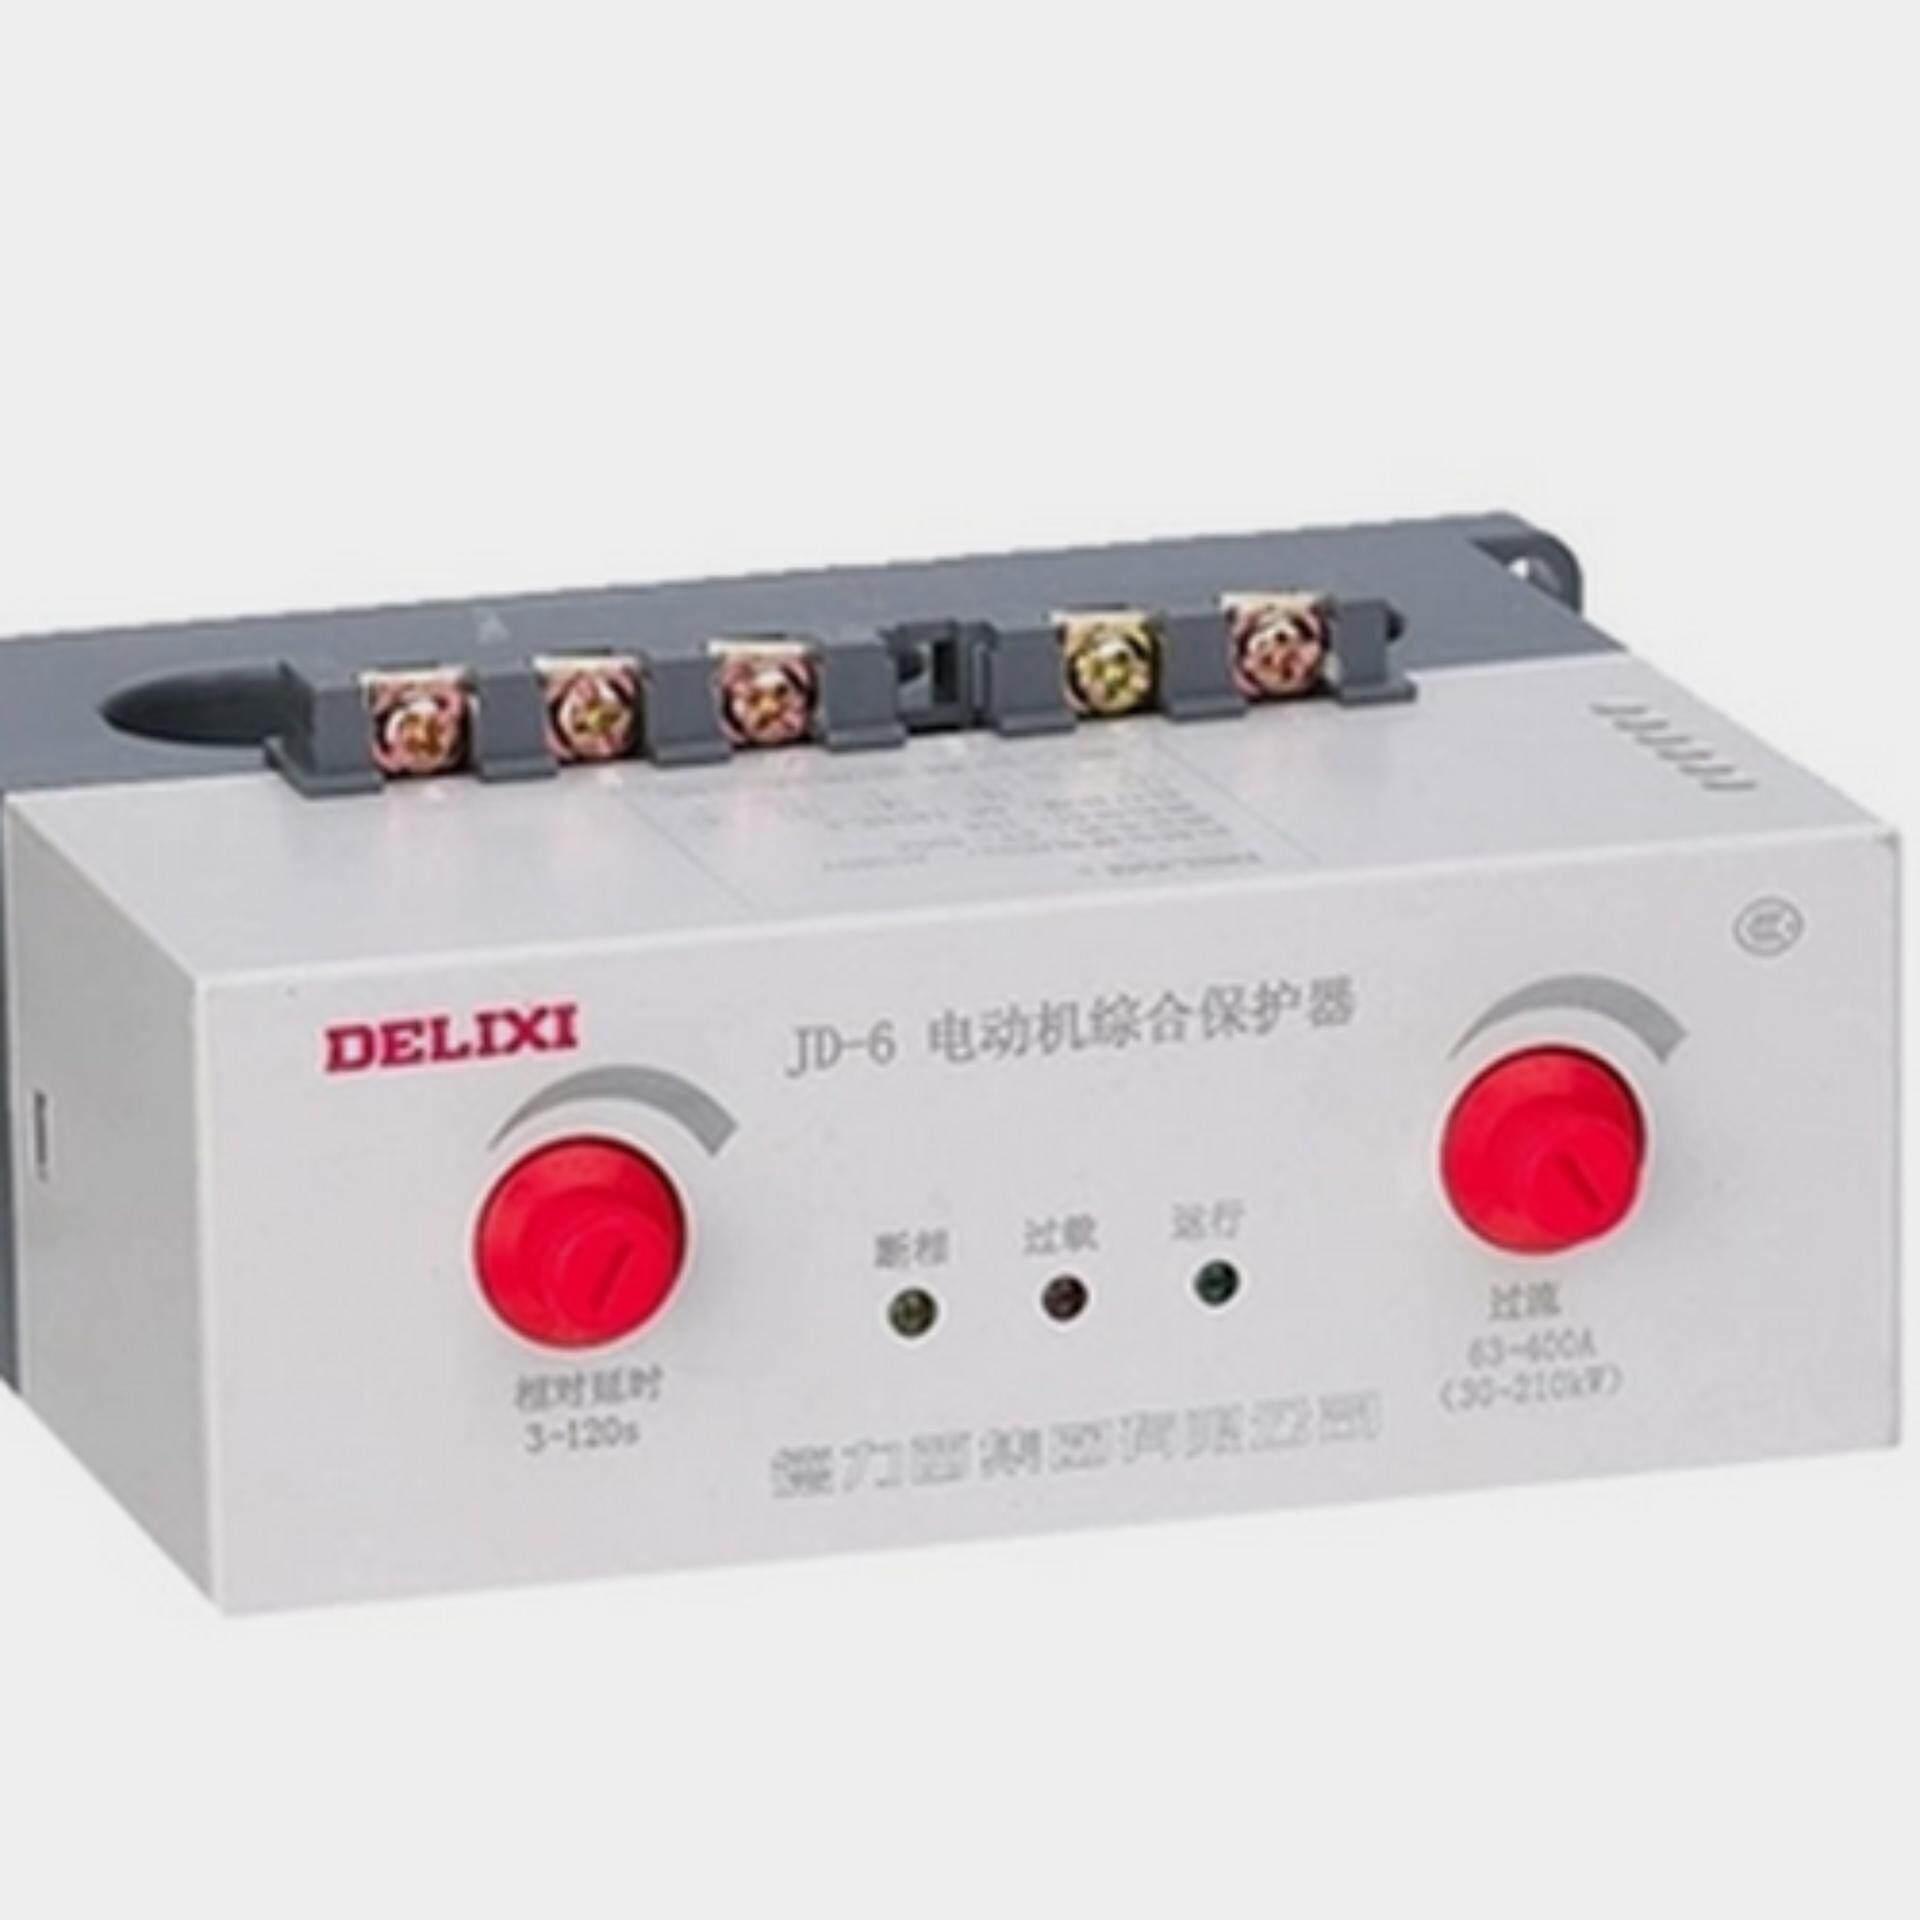 JD-6 63-400A AC380V Motor Pelindung Terpadu Perangkat untuk Alarm atau Perlindungan Operasi, Kesalahan Phase, overload Indikator Kesalahan Sirkuit Lampu dan Motor Kesalahan Fase, Overload, Blok Perlindungan Perpindahan Delixi-Internasional